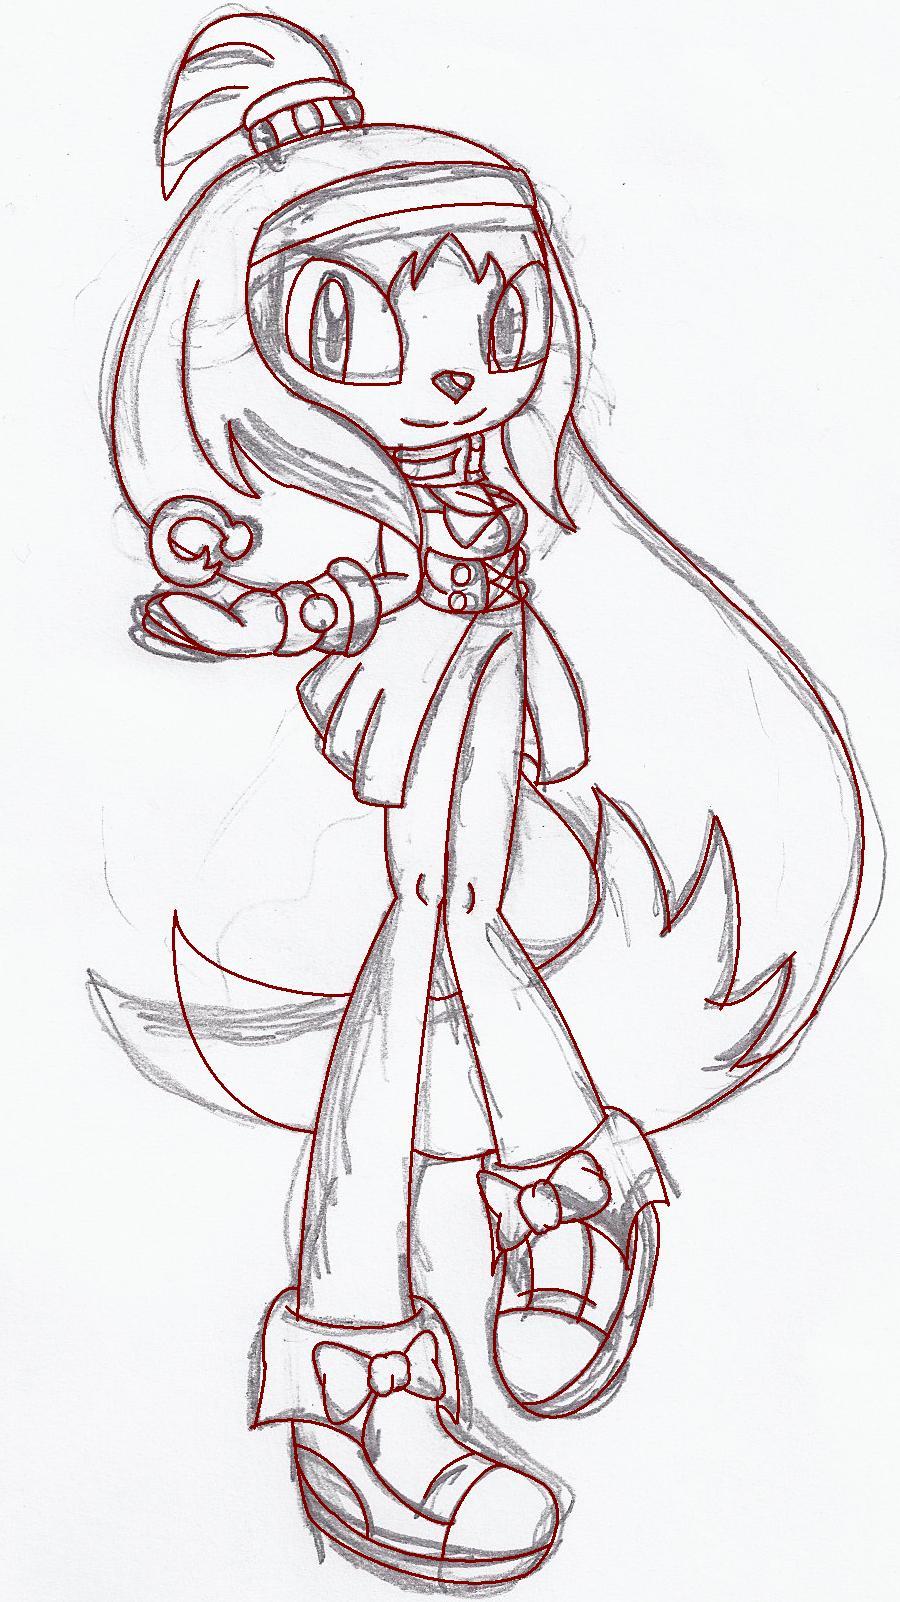 original character coni shun the spirit by conishunfan